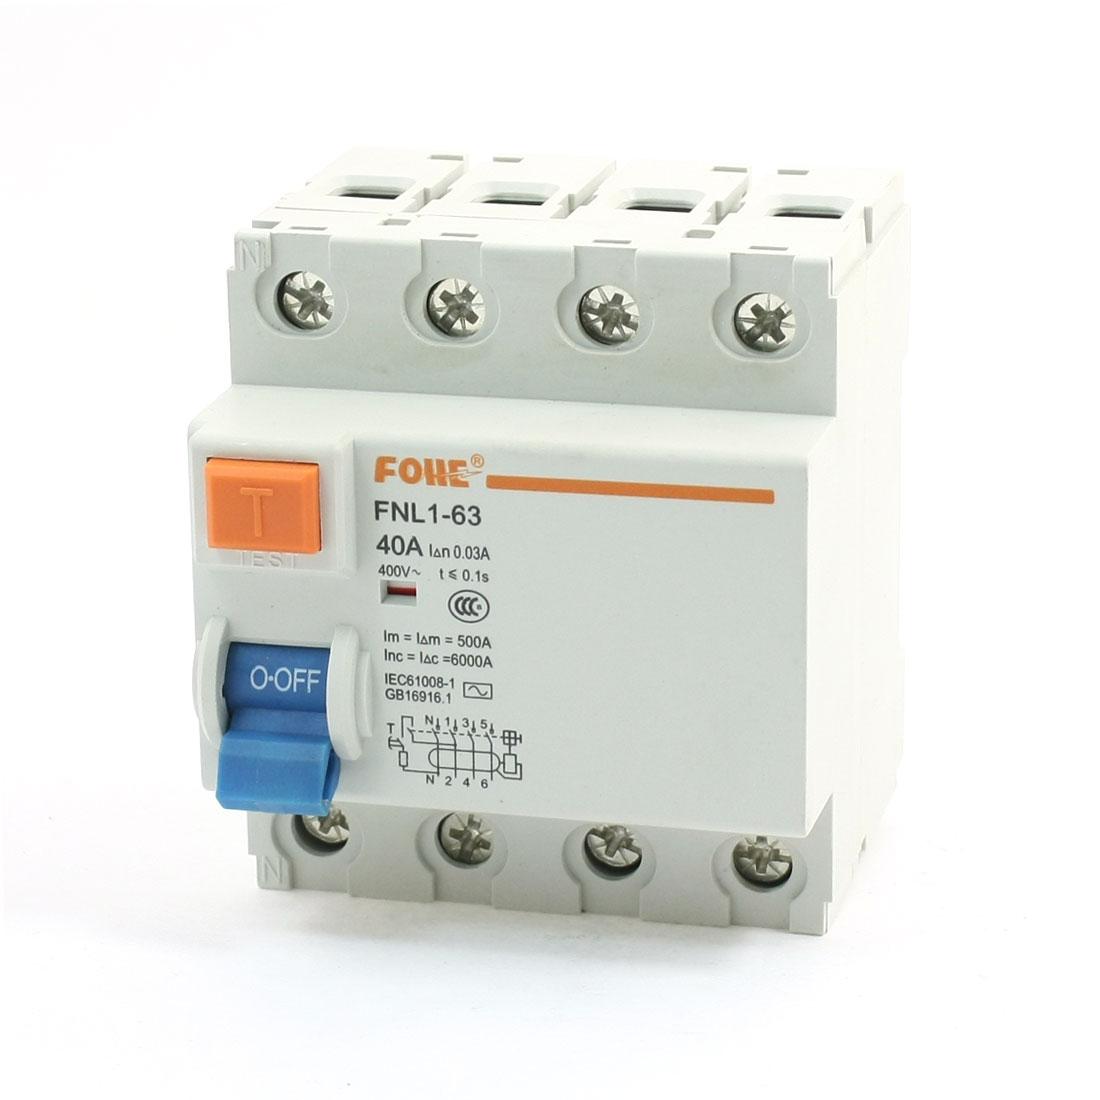 35mm DIN Rail Mount 6000A Overload Circuit Breaker 4 Poles 4P 400V 40A